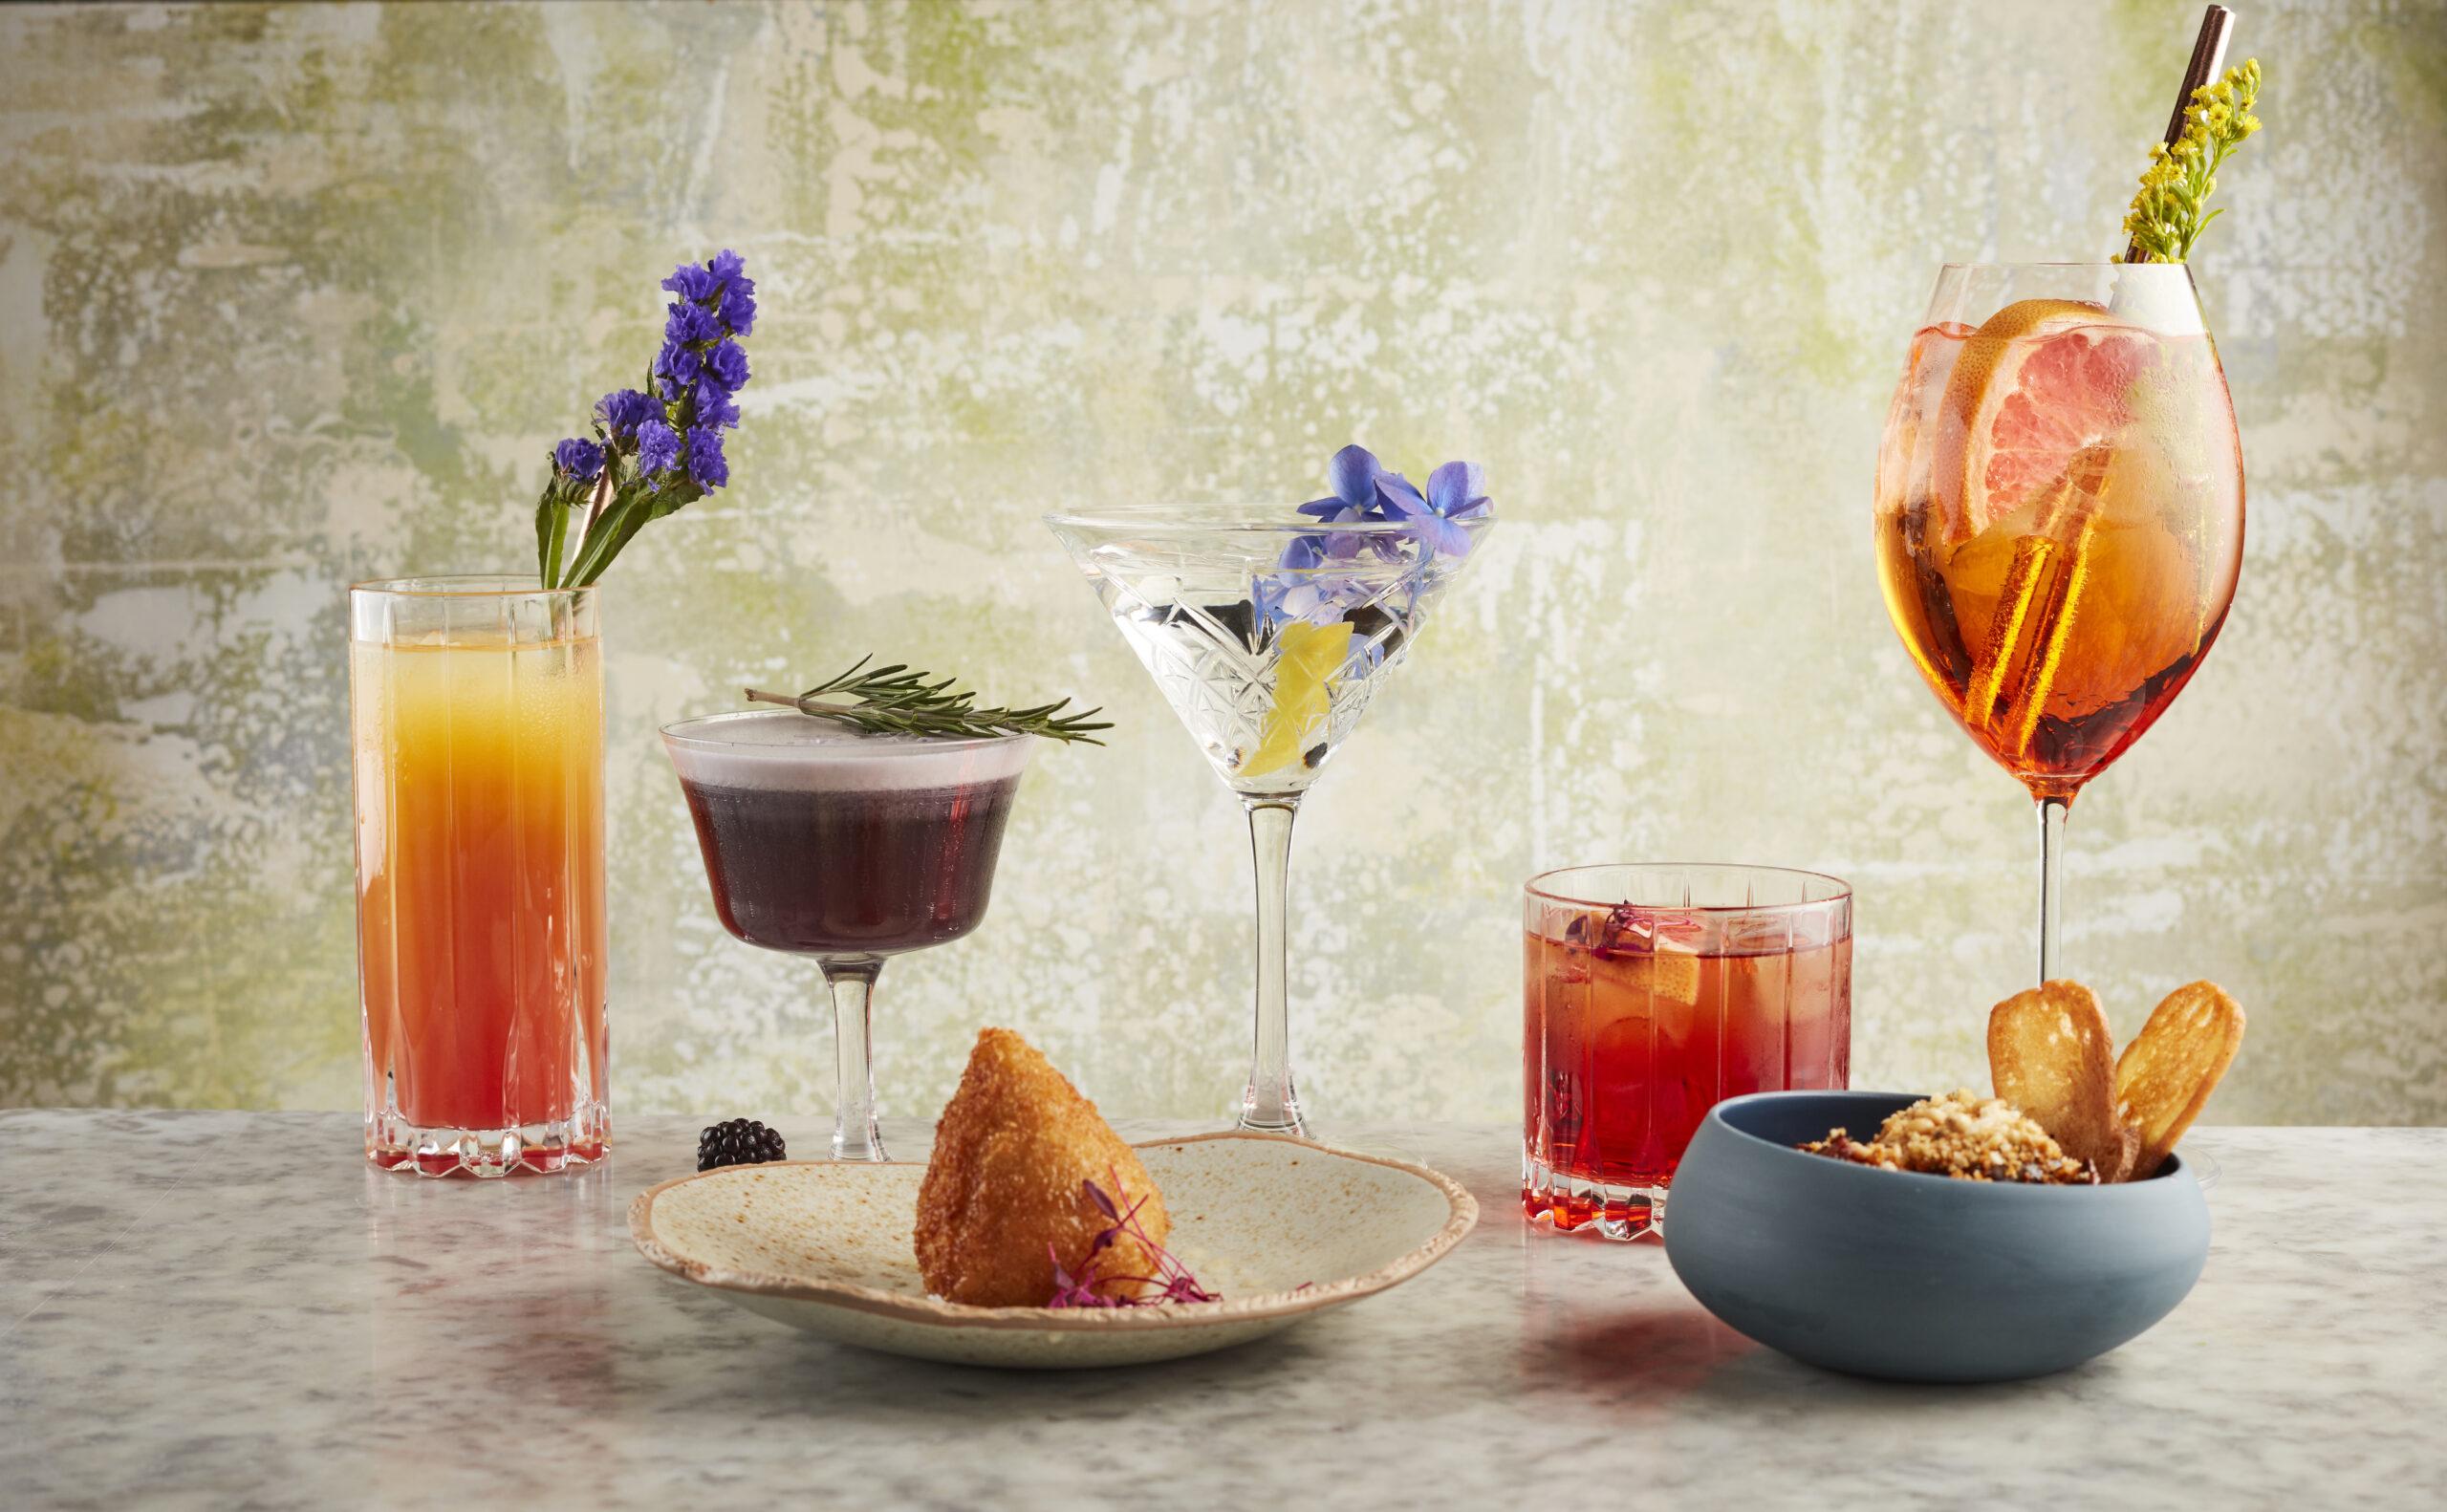 Cocktails and small plates at Como Garden, Kensington (Photo Credit: Jodi Hinds Food Photographer London)